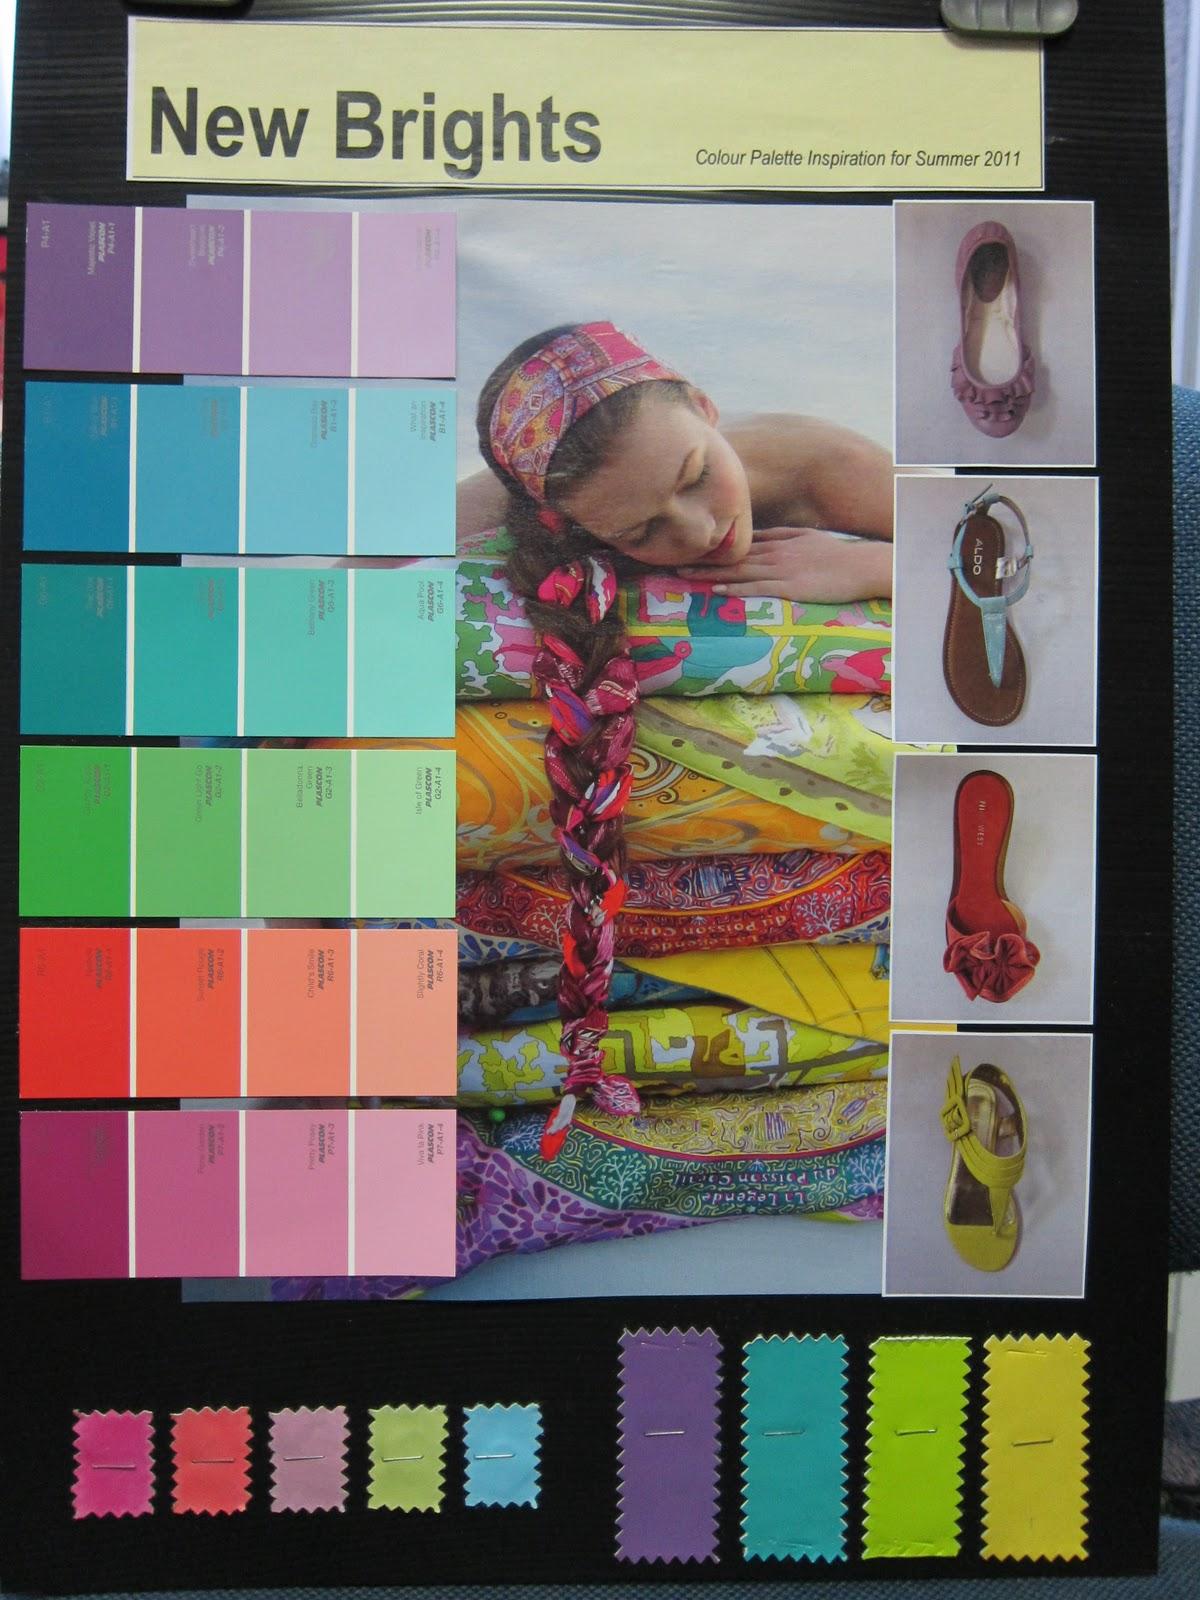 http://1.bp.blogspot.com/_Q4b_v2nW4IY/TMF-dV9bAEI/AAAAAAAAAL8/8YSBMrdnxis/s1600/Colour+Inspiration+Boards+Q1+Summer+2011+004.jpg